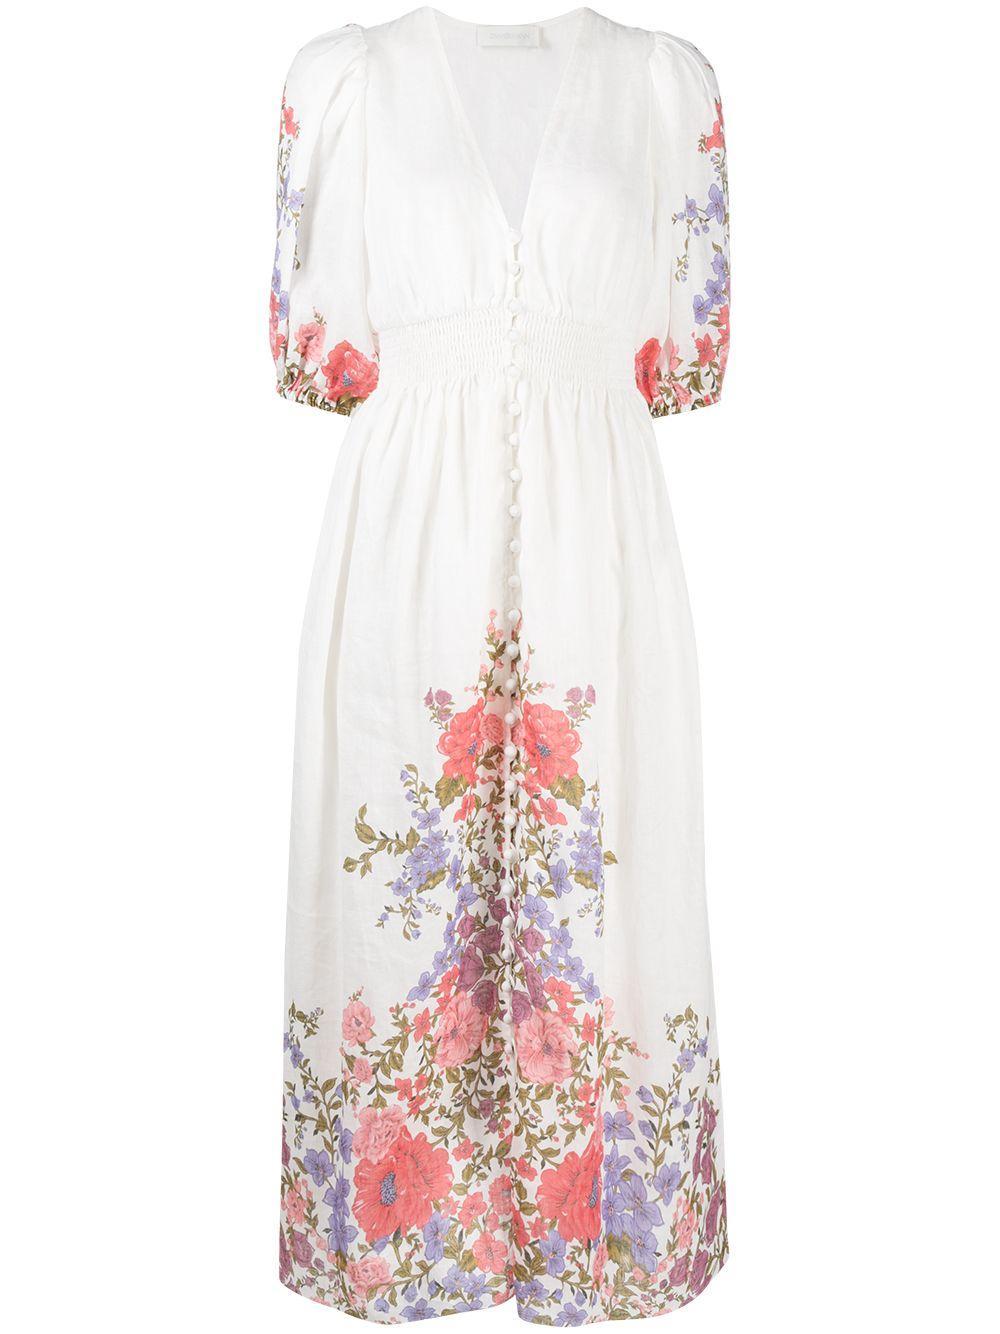 Poppy Shirred Waist Floral Print Dress